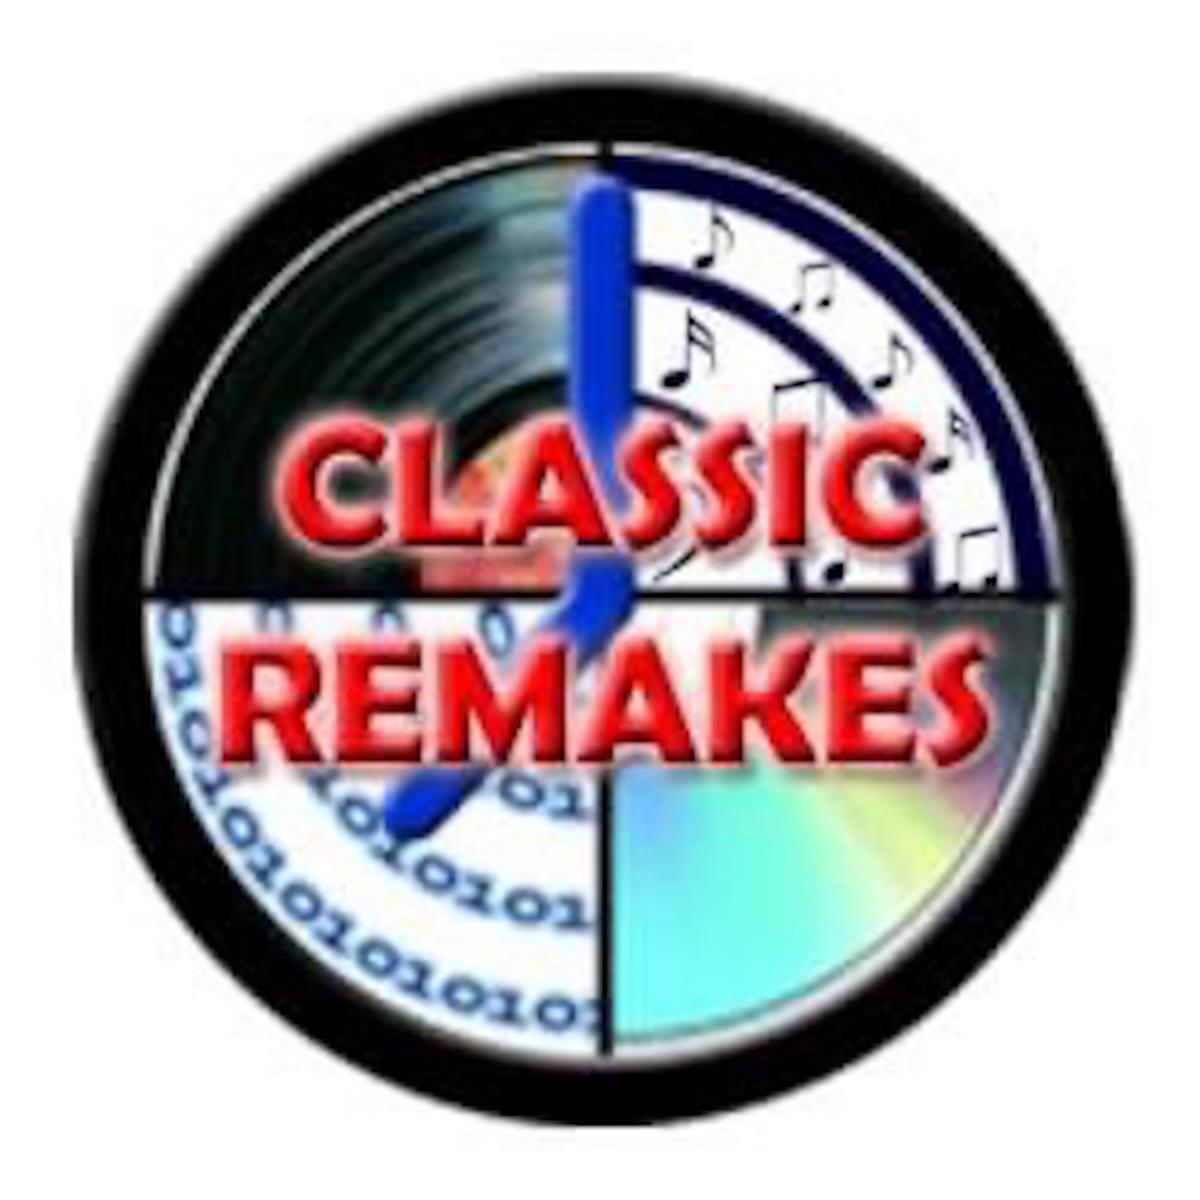 Classic Remakes